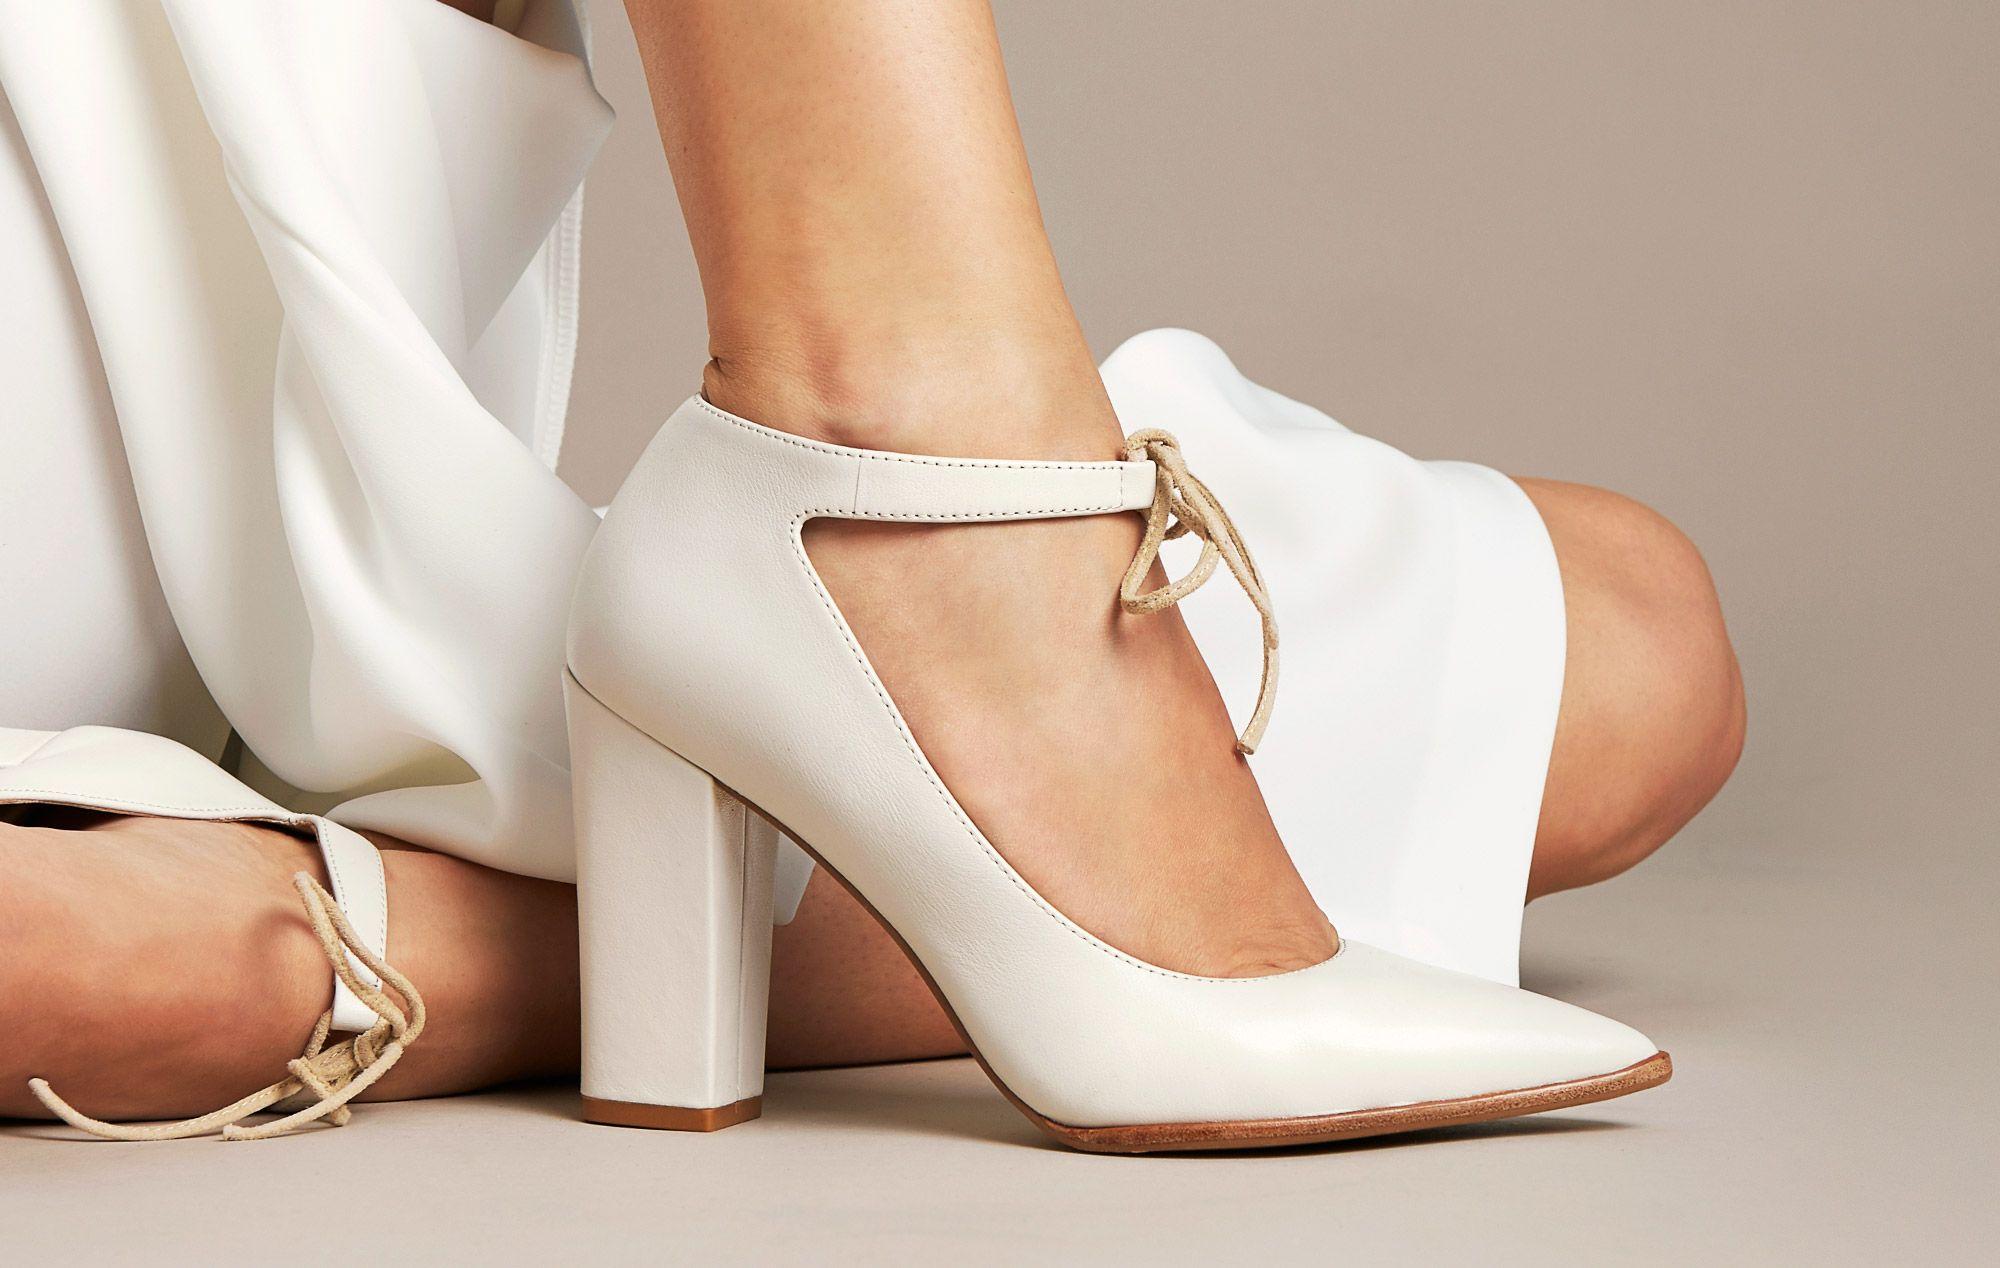 White Elda high heel with ankle strap   Tashers Shoes   Pinterest b365b6a9b66f